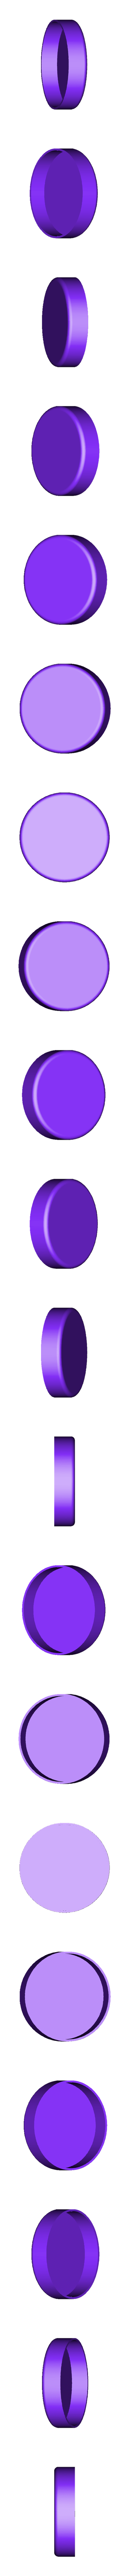 GPS_Dome_Top.stl Download free STL file Experimental Multirotor • 3D printable model, SeanTheITGuy